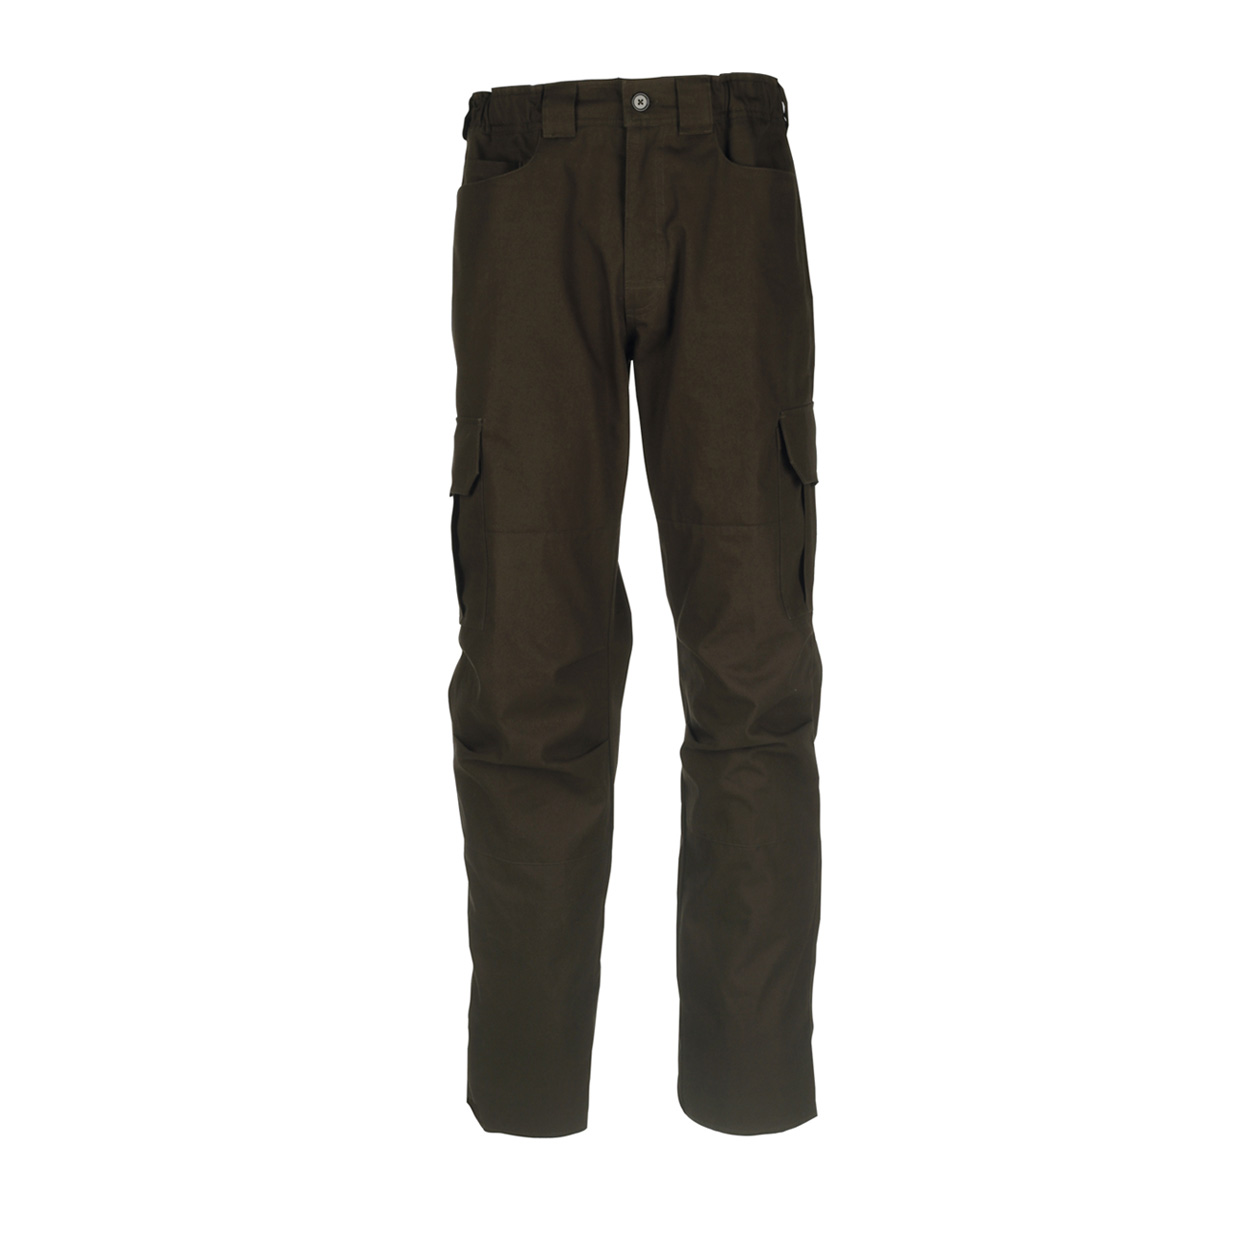 Pantalone Pula Canvas Cotton